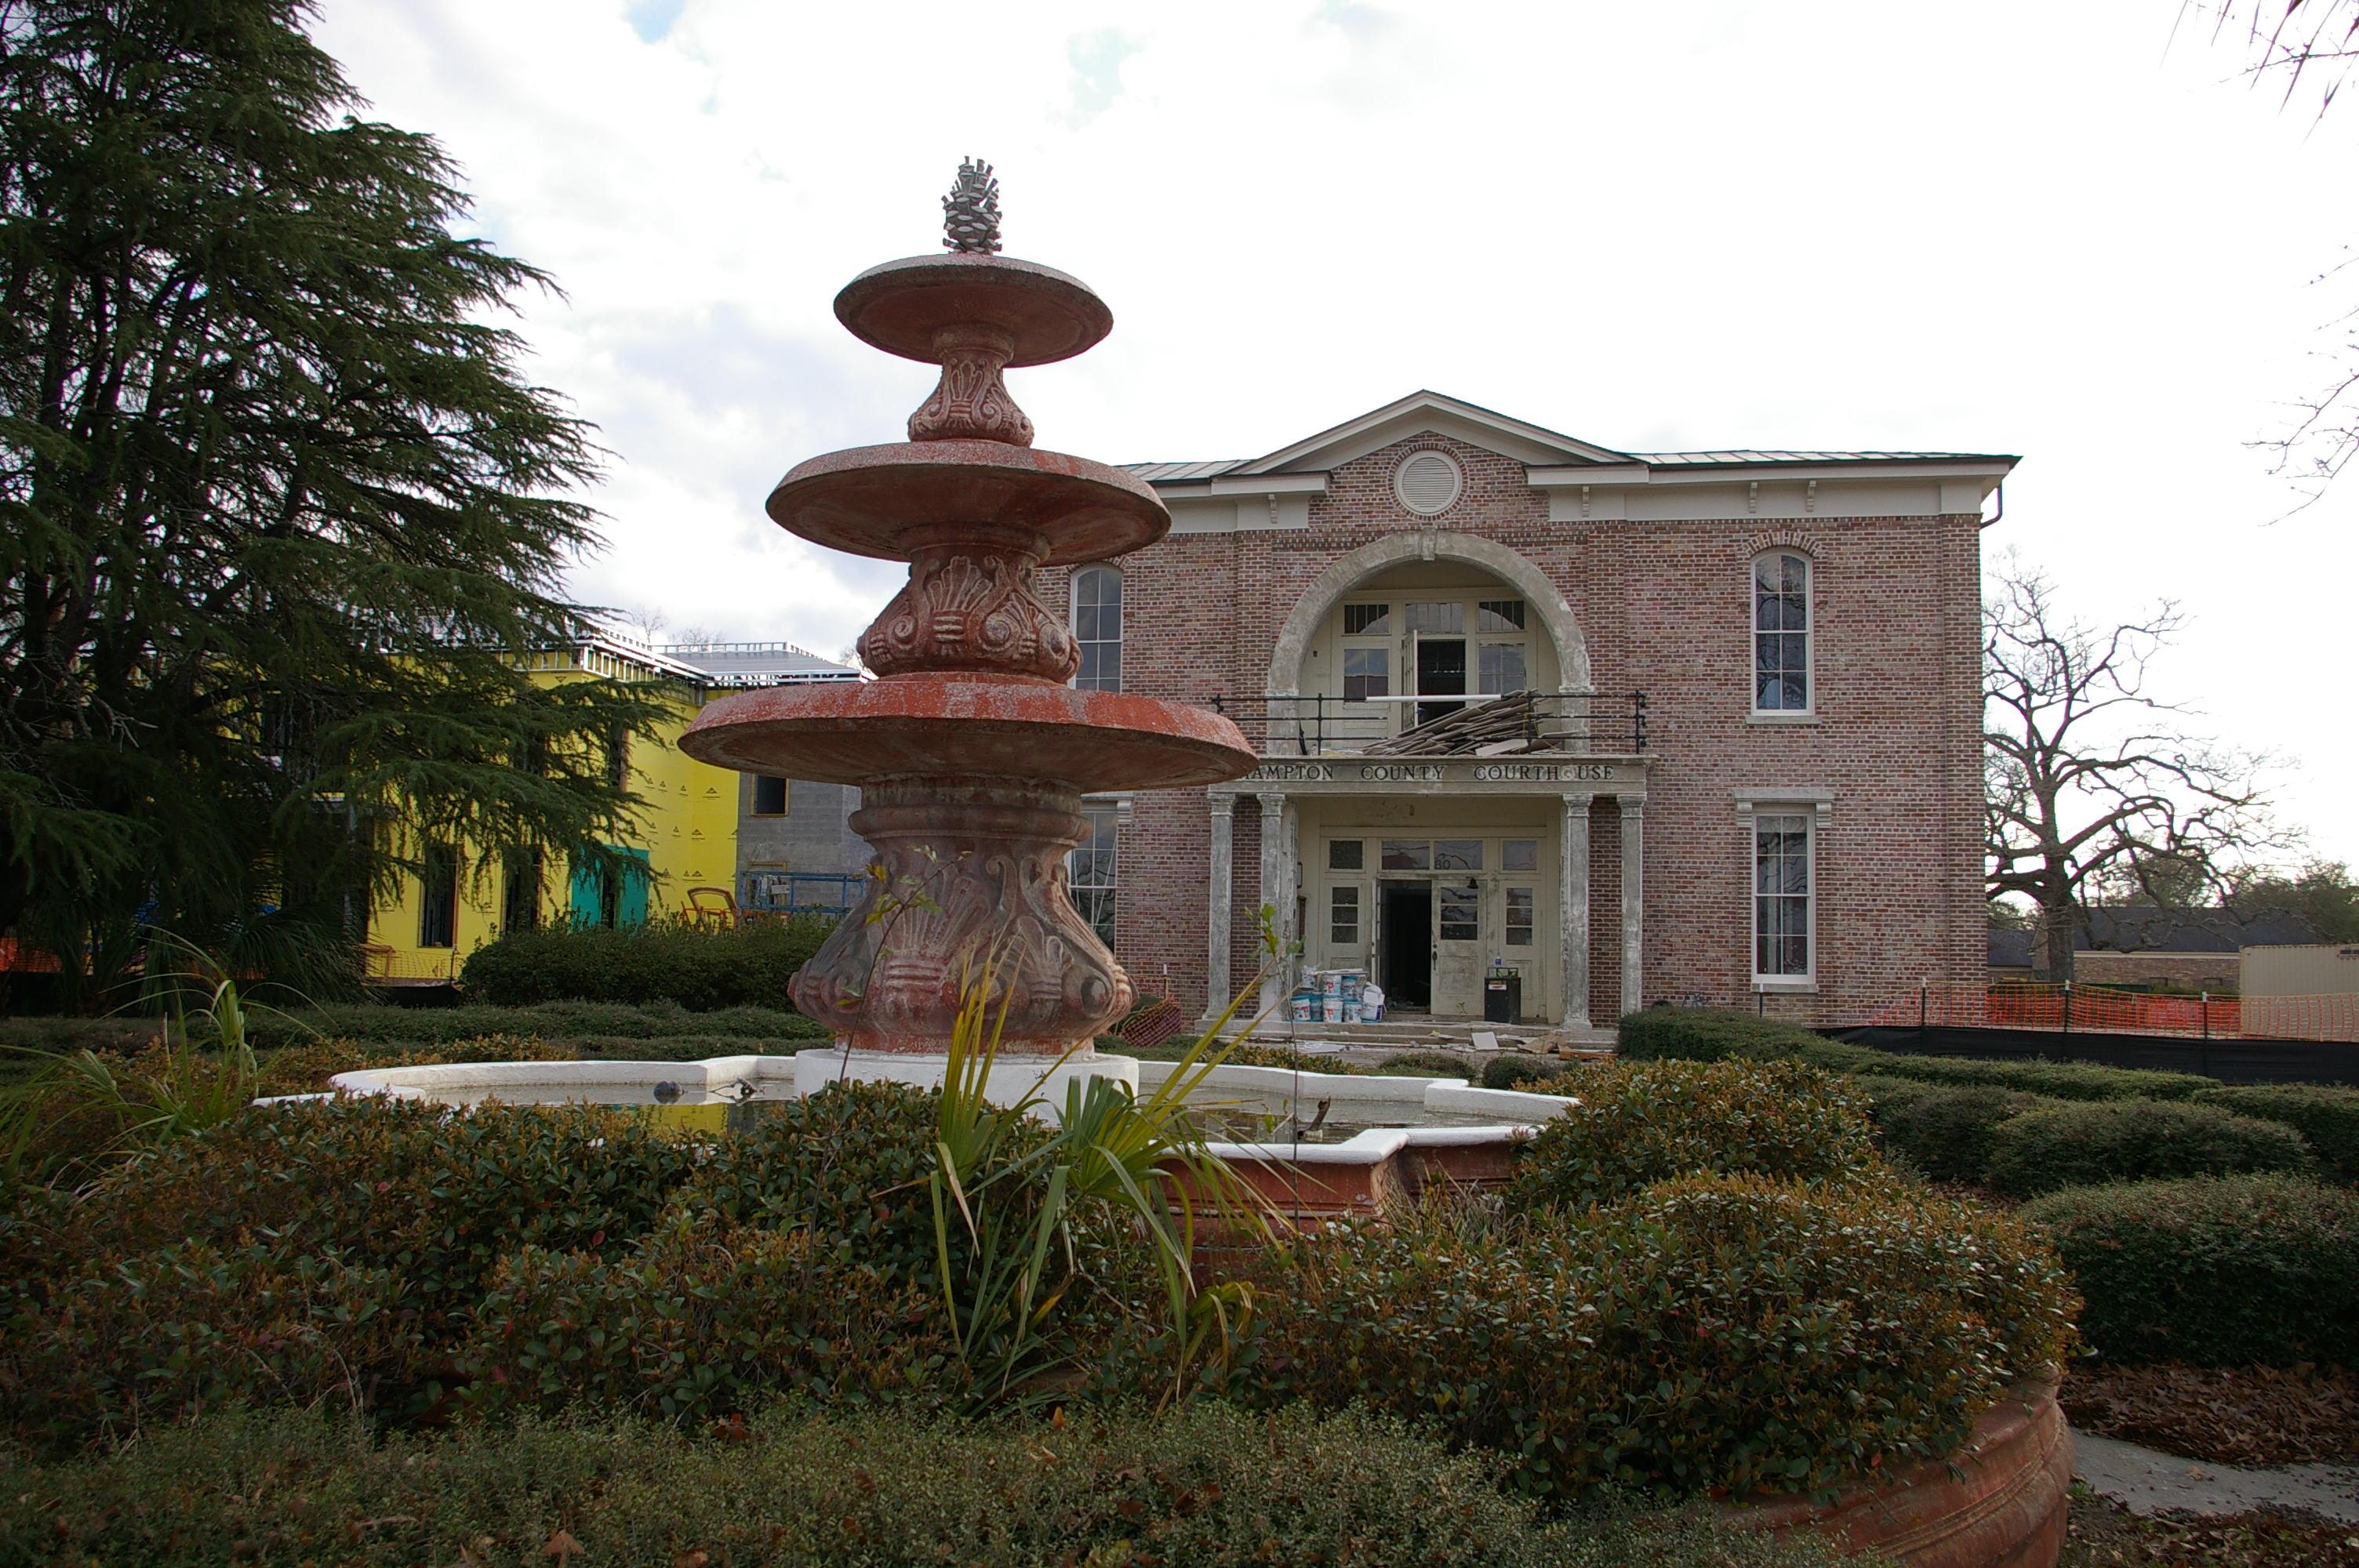 hampton county Home of the hampton county sheriff's department.